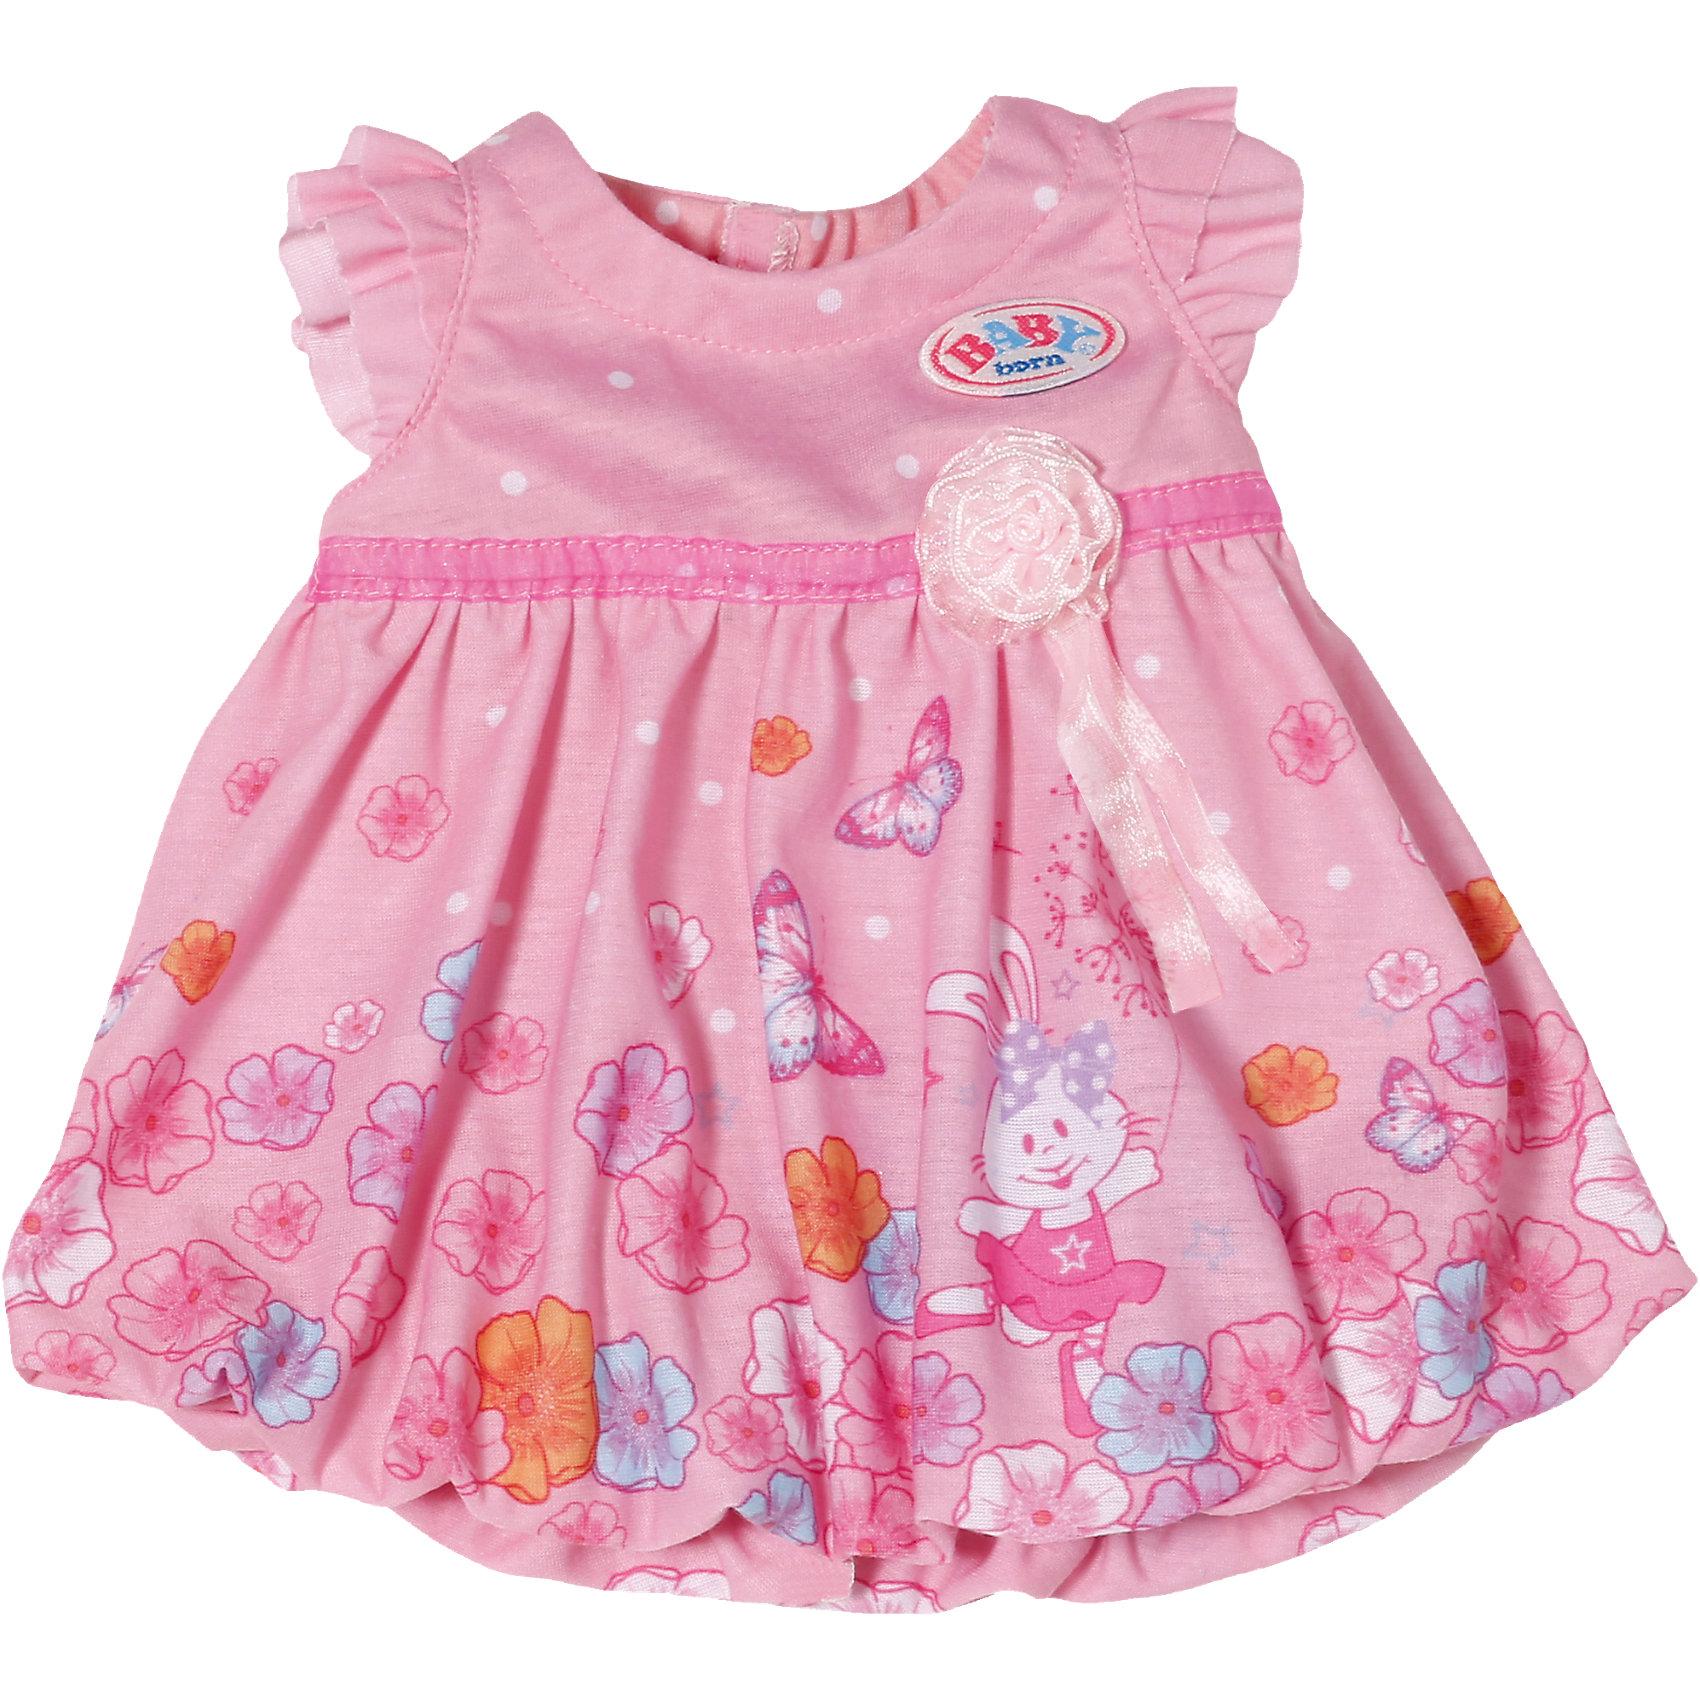 Zapf Creation Платье для куклы, BABY born, в ассортименте baby born подгузники для куклы